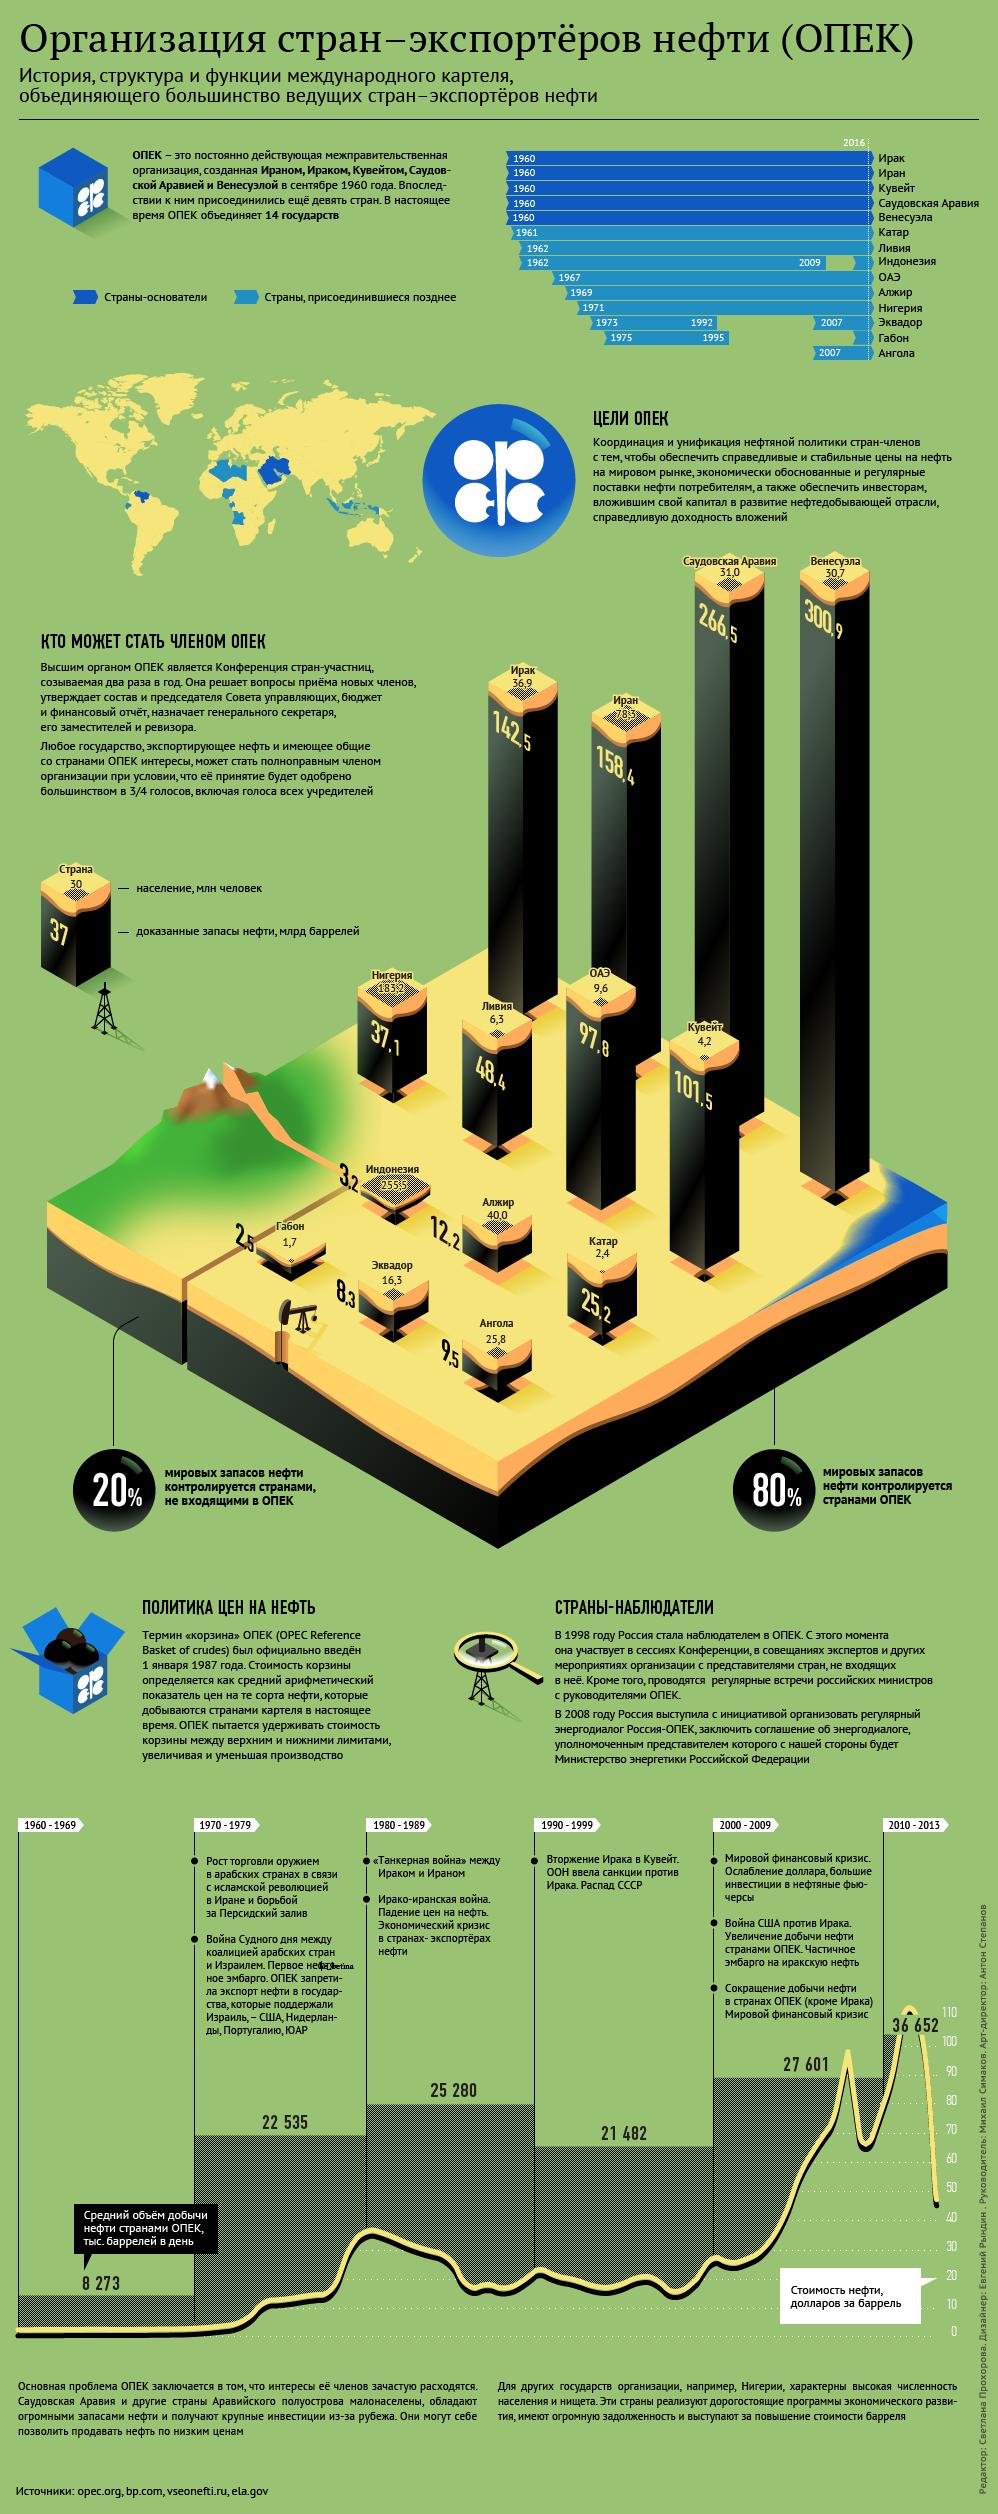 Структура и задачи ОПЕК